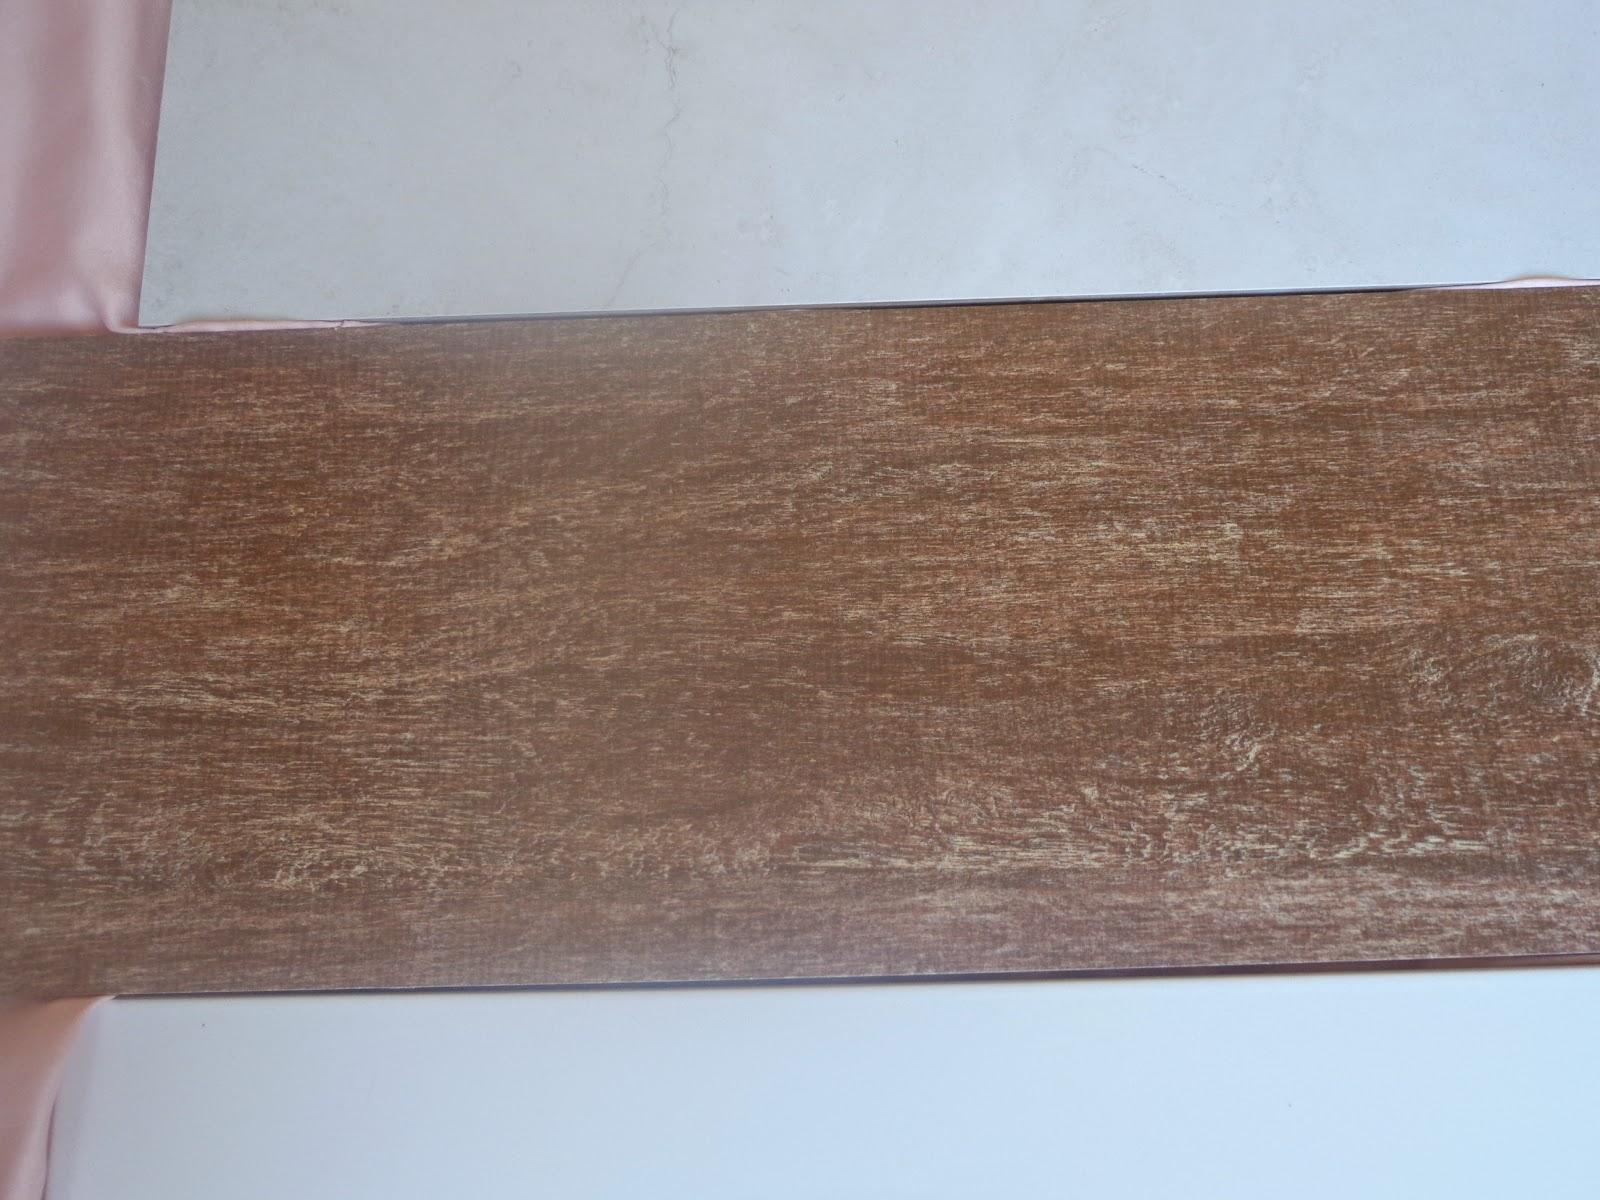 Revestimento idea bianco (fosco) 30X60 DA Portobello #486483 1600x1200 Azulejo Fosco Banheiro